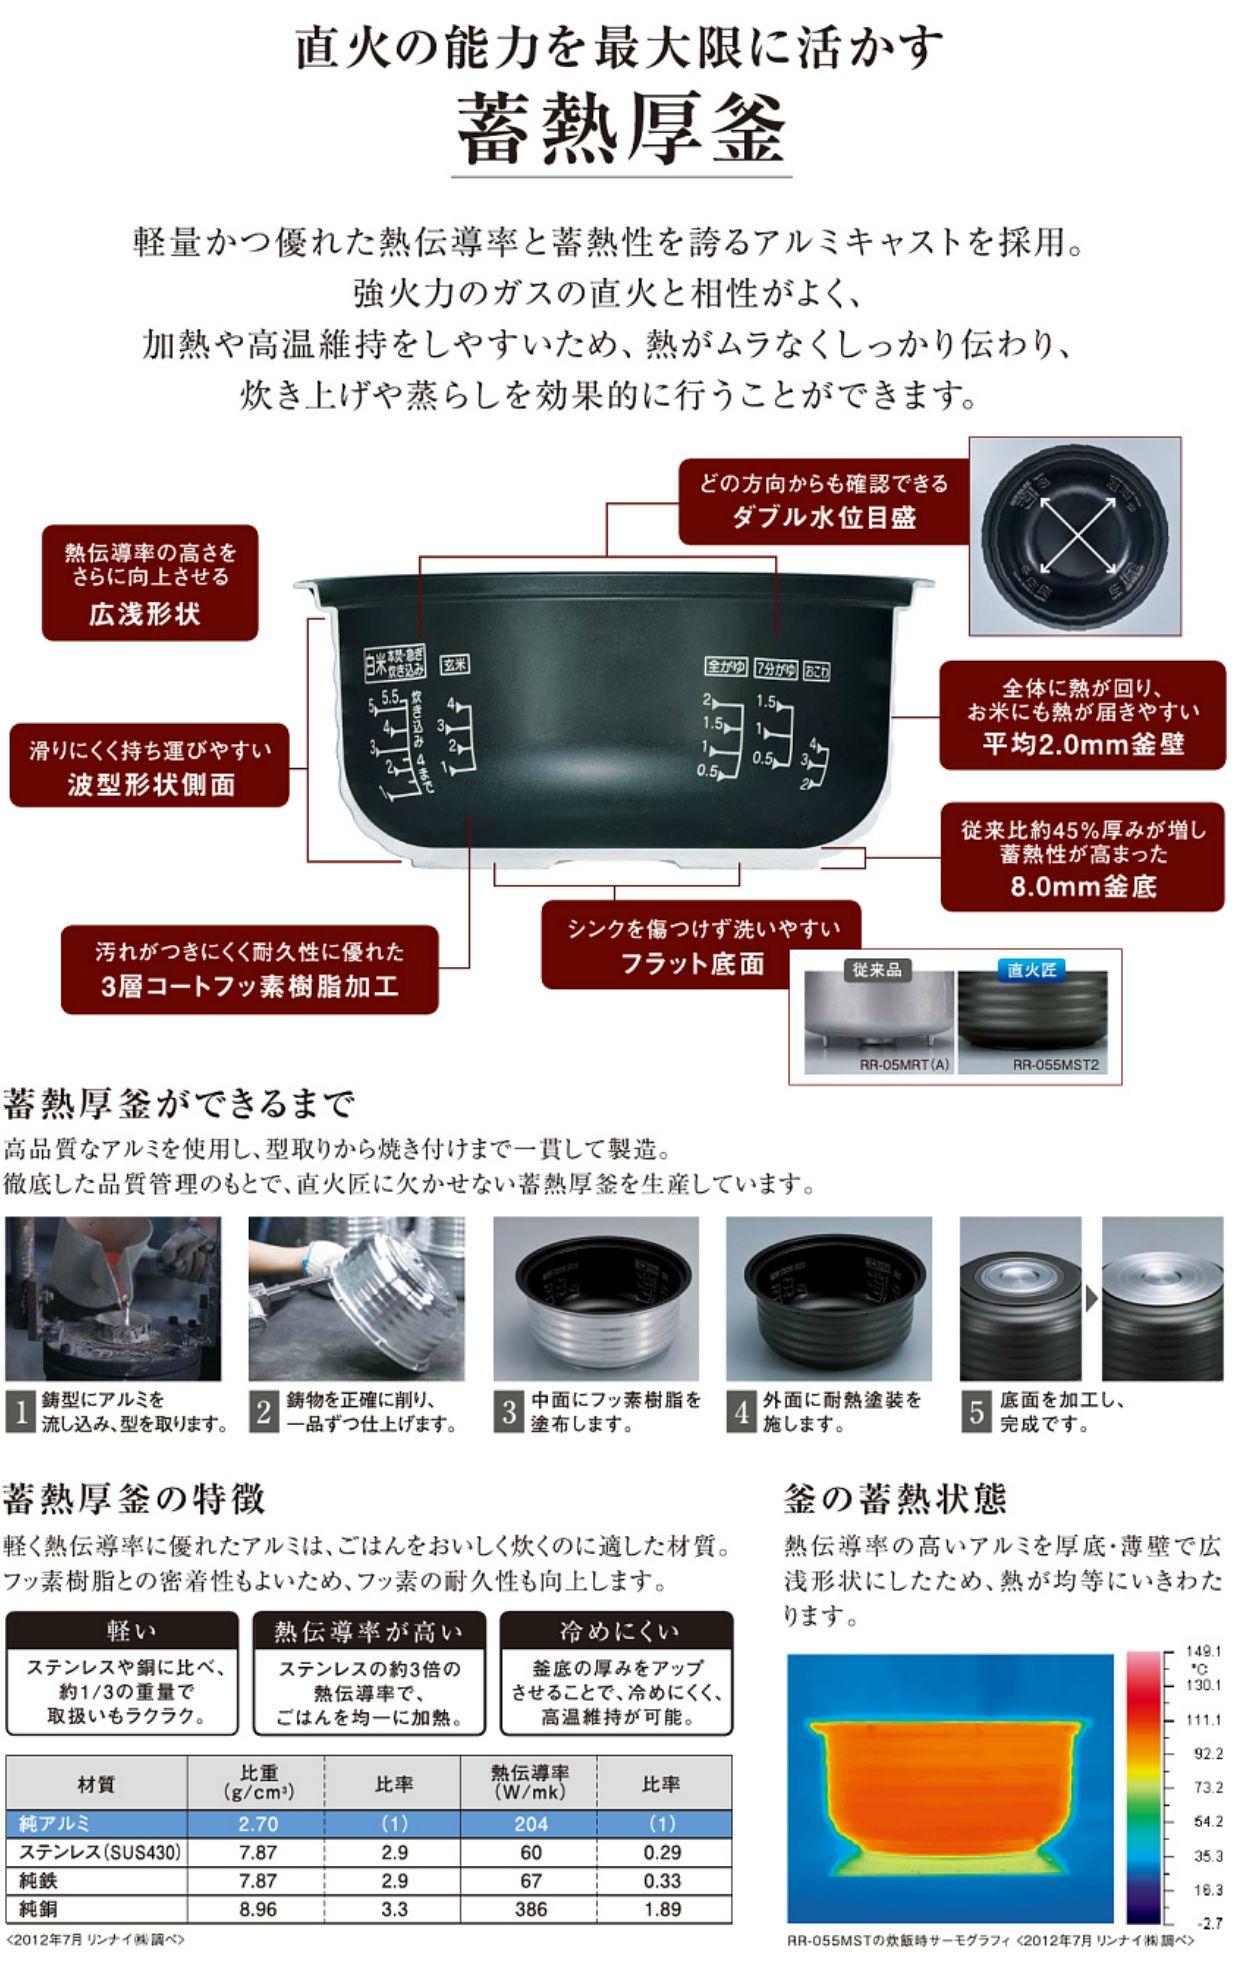 RR-100MST2 直火匠ガス炊飯器